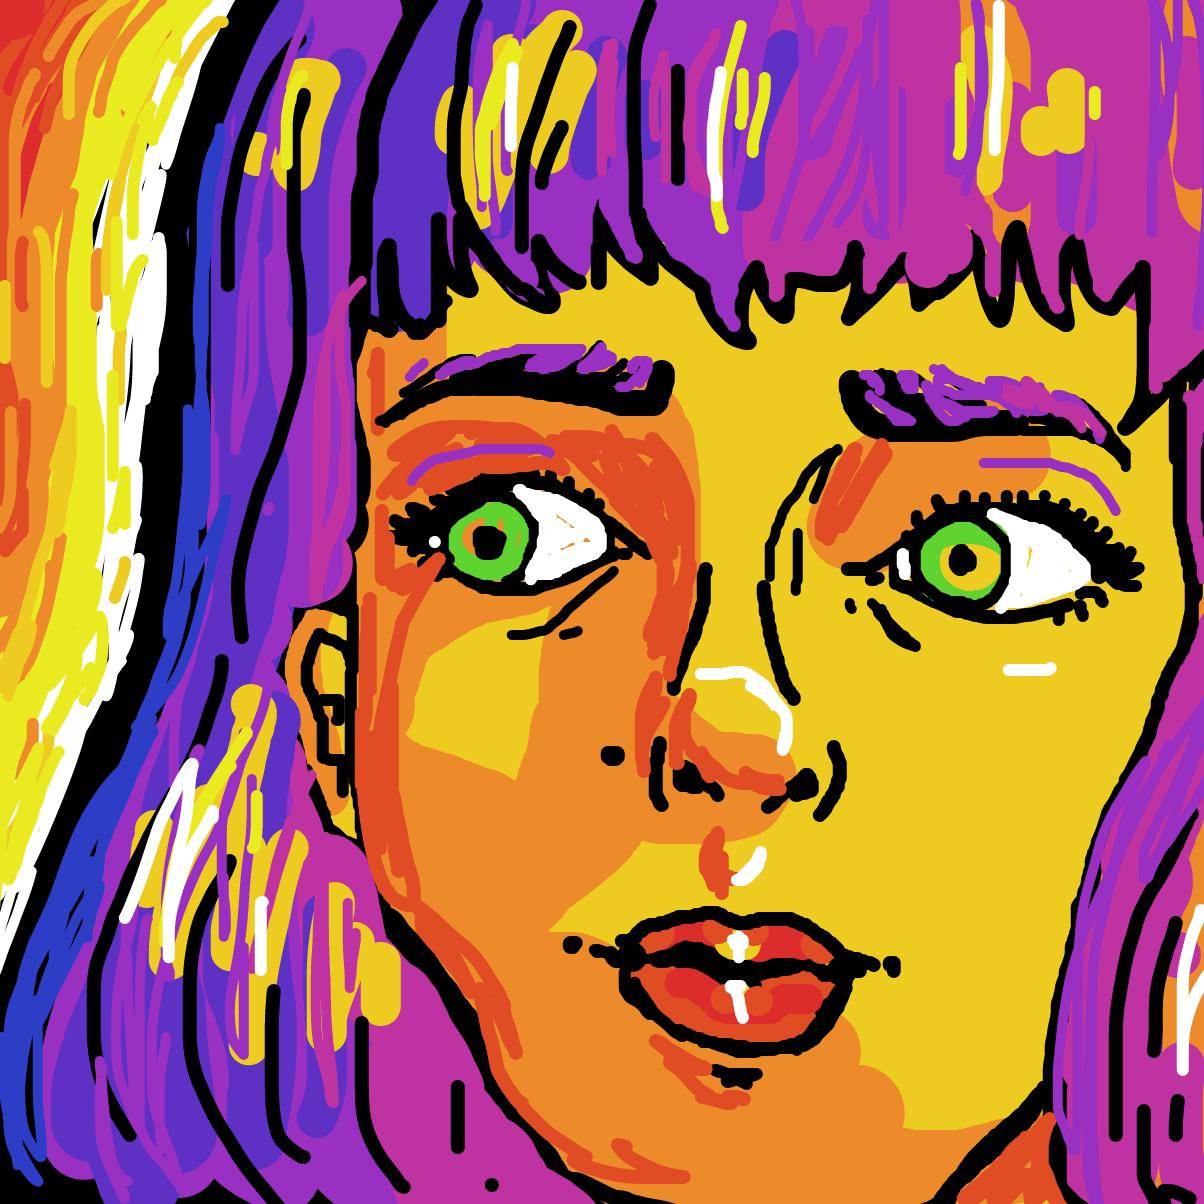 Profile picture by the comic artist dribblio